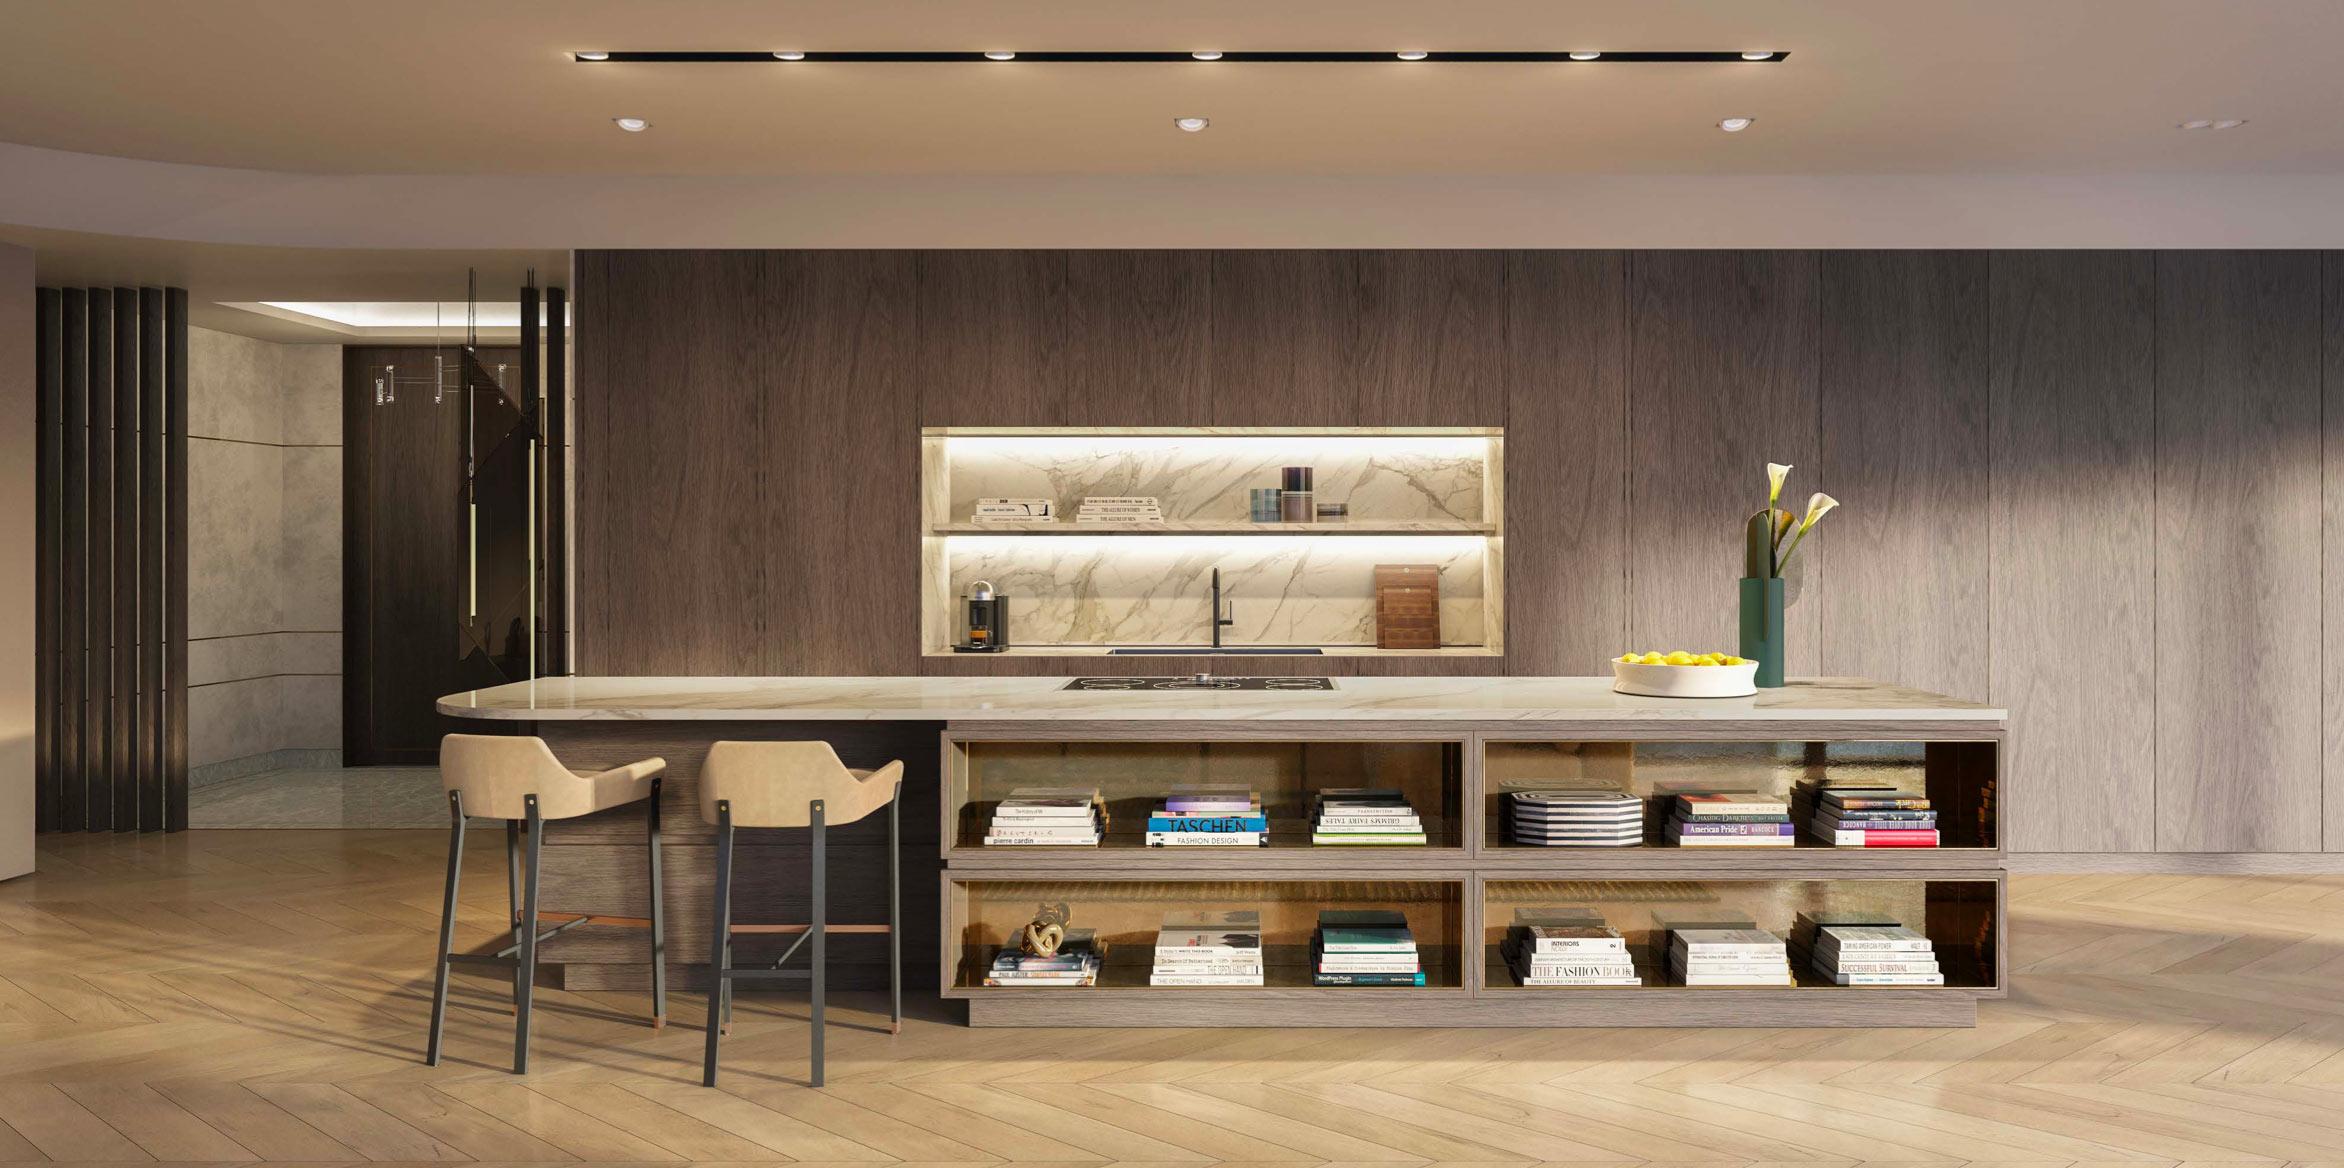 waldorf-astoria-miami-residences-condos-preconstrucion-florida-interiors